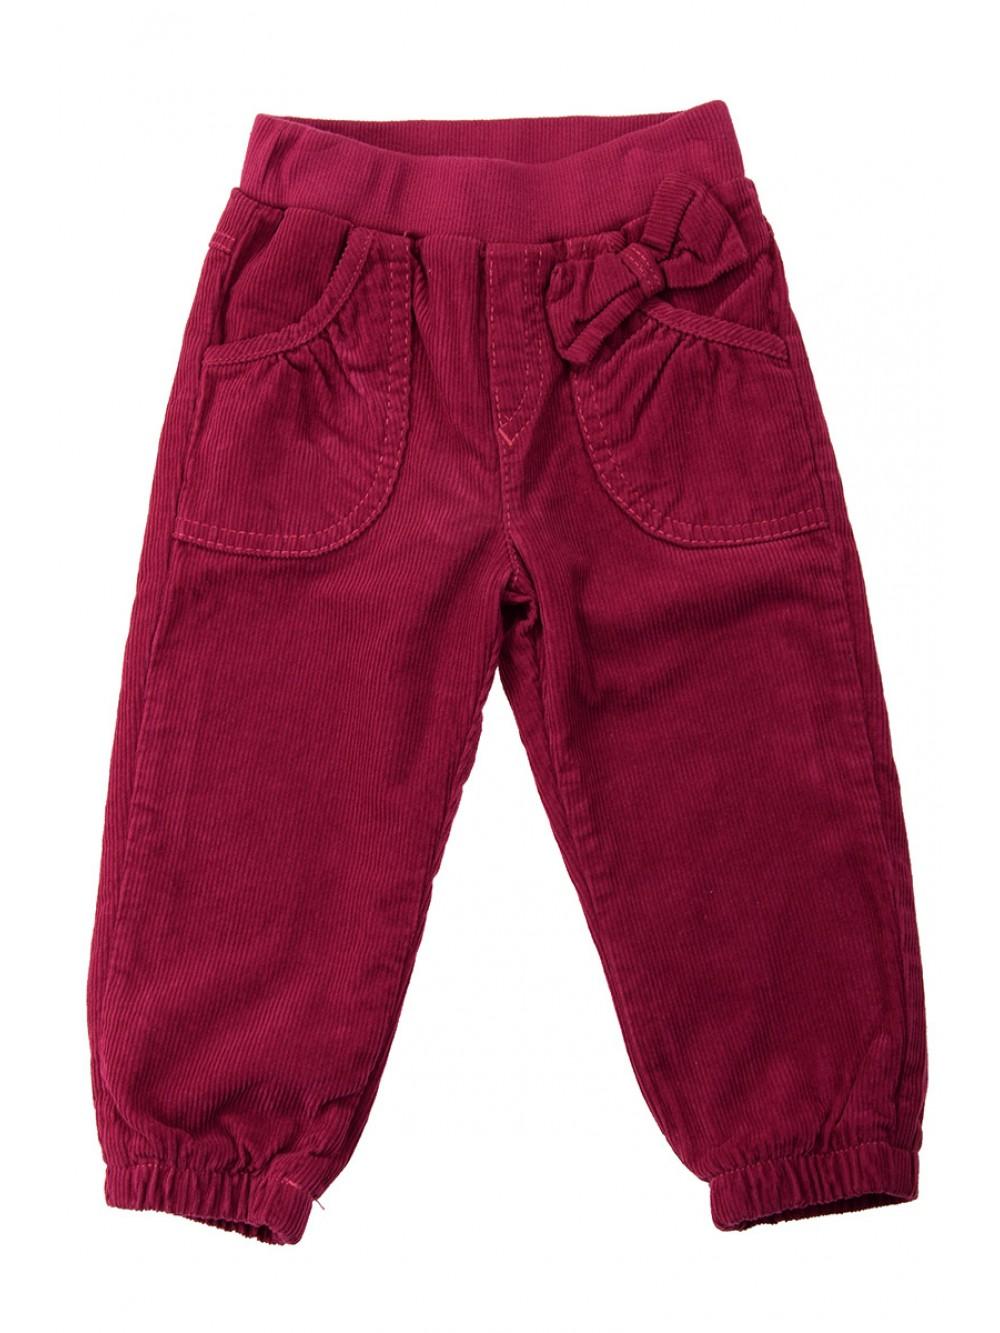 Джинсов панталон с подплата (18 мес.)